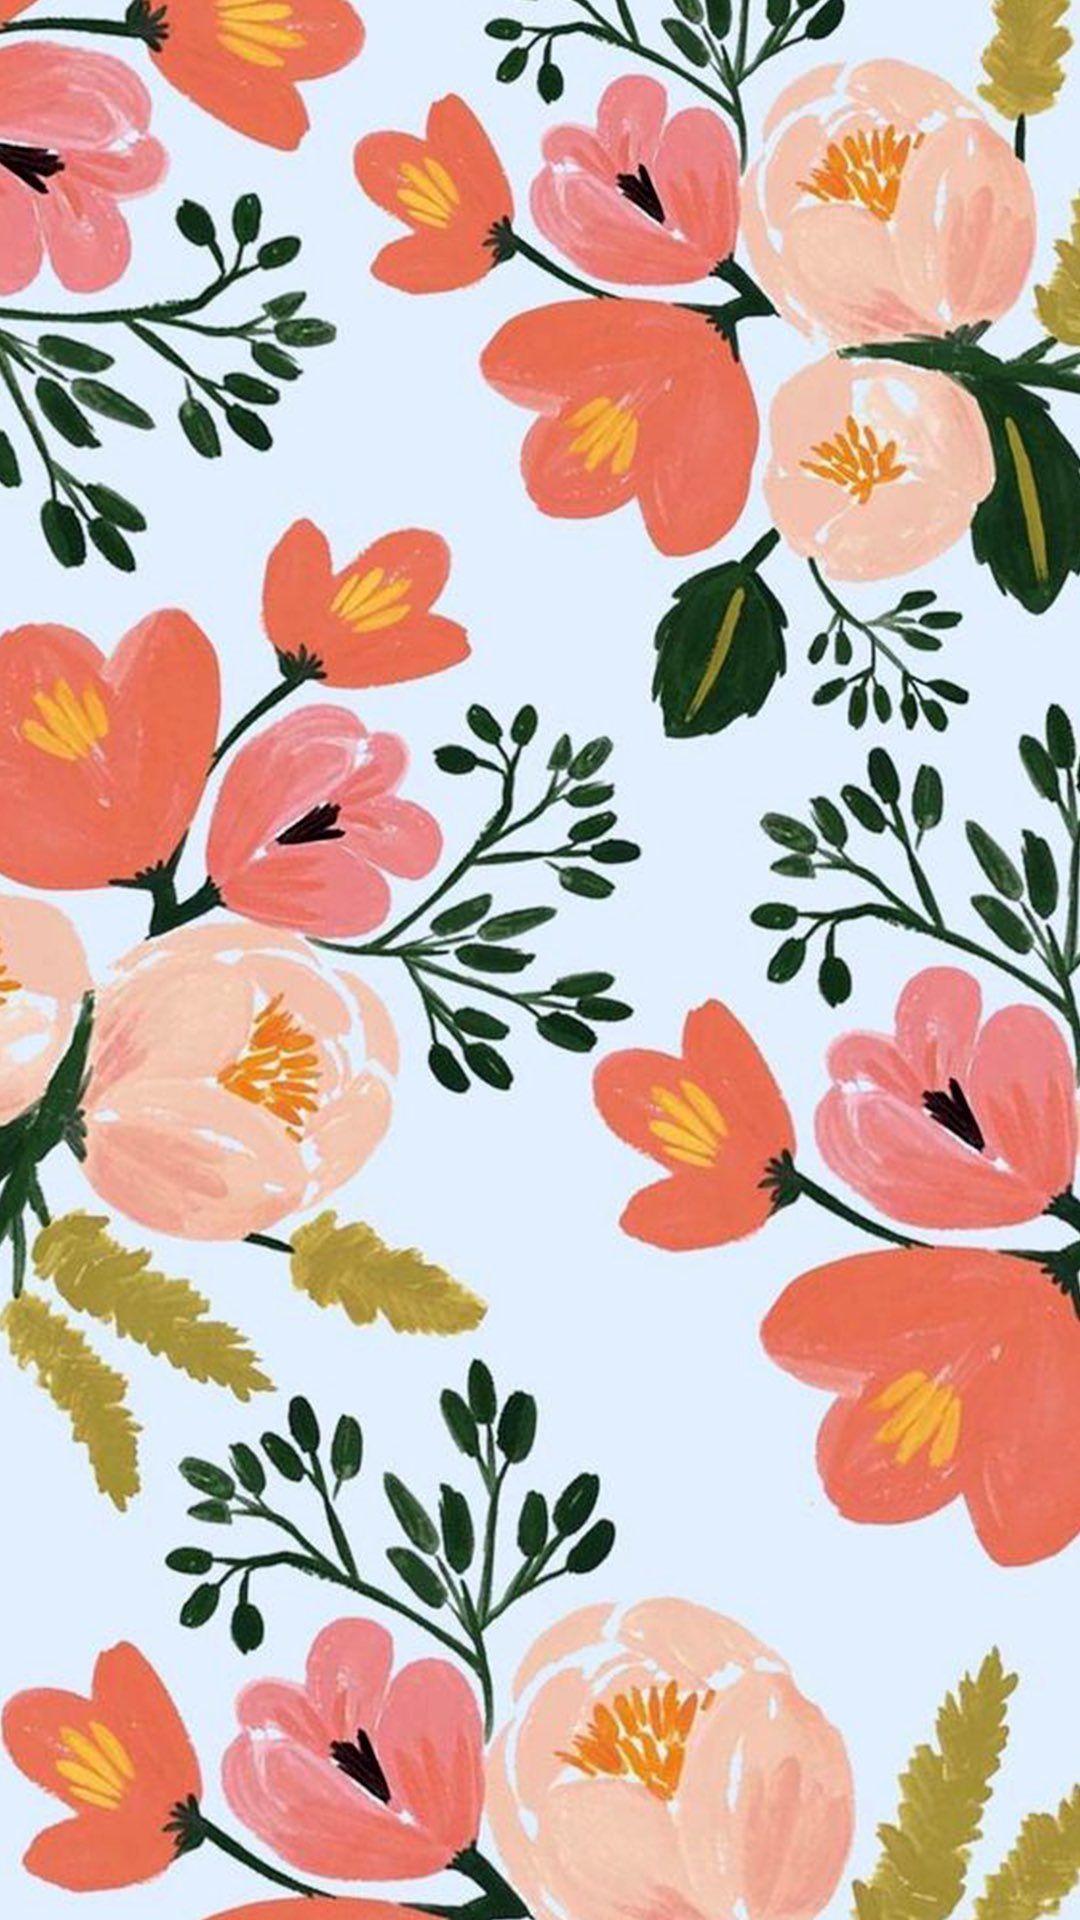 Cute Floral Iphone Wallpaper Hd 4k Floral Wallpaper Iphone Floral Iphone Background Tumblr Iphone Wallpaper Cute flower wallpaper hd